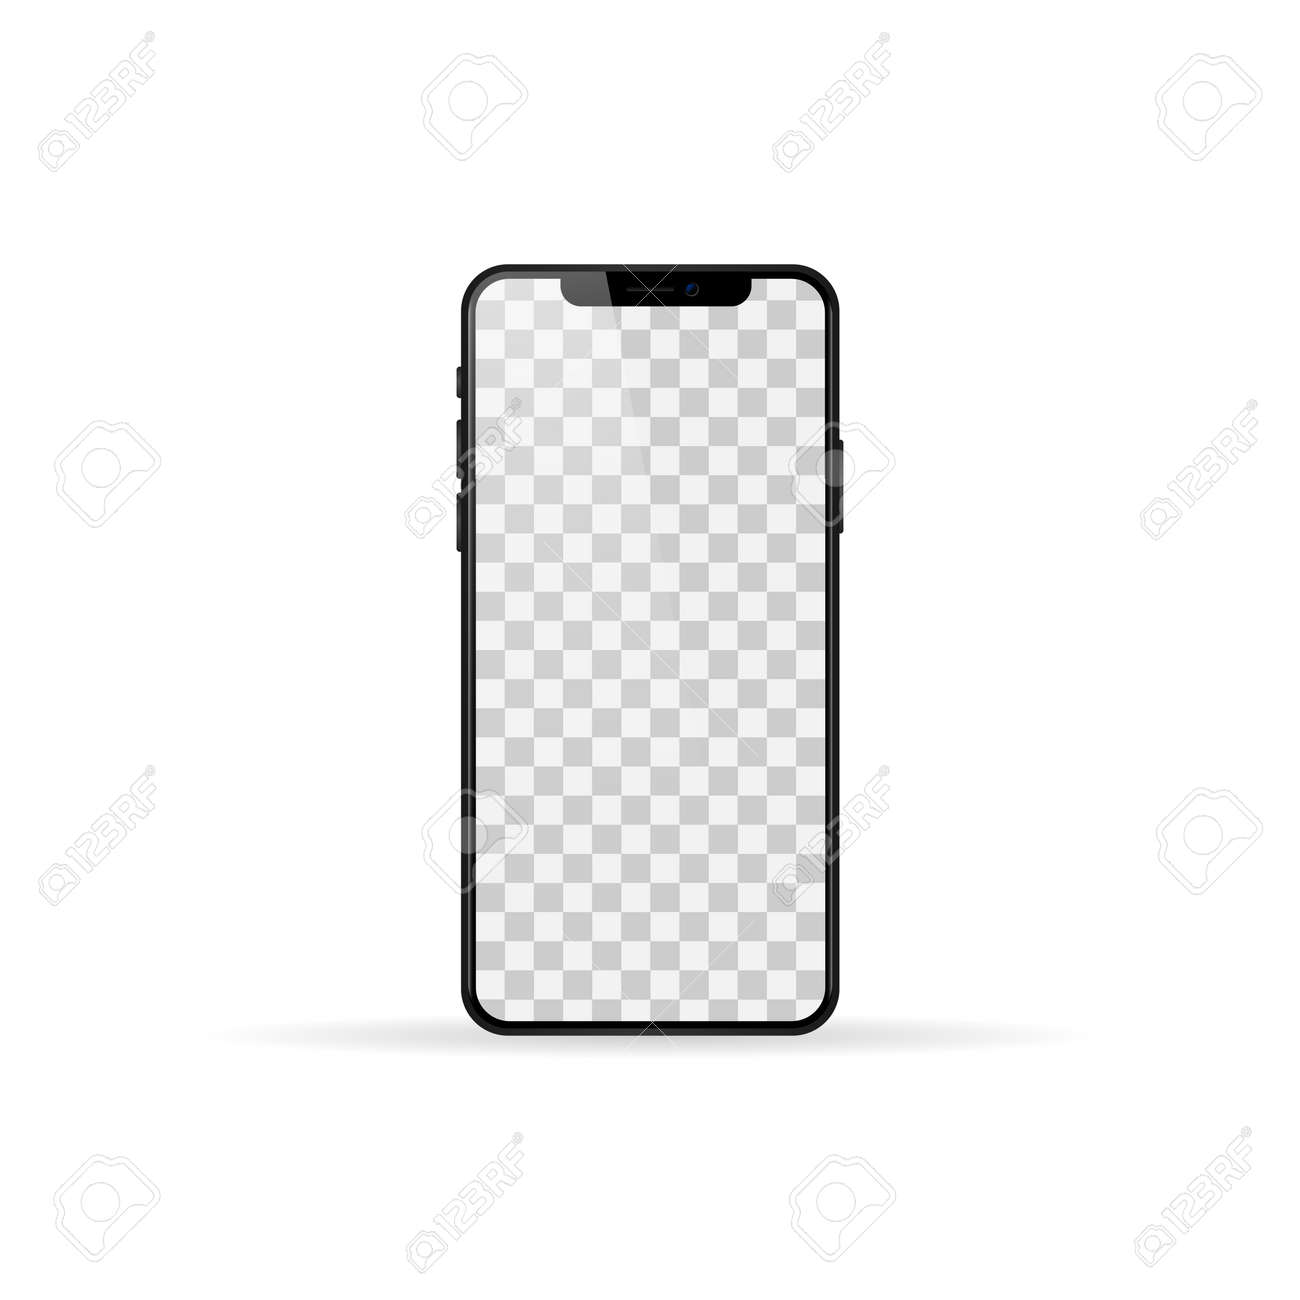 Mockup smartphone pro screen. - 169325542